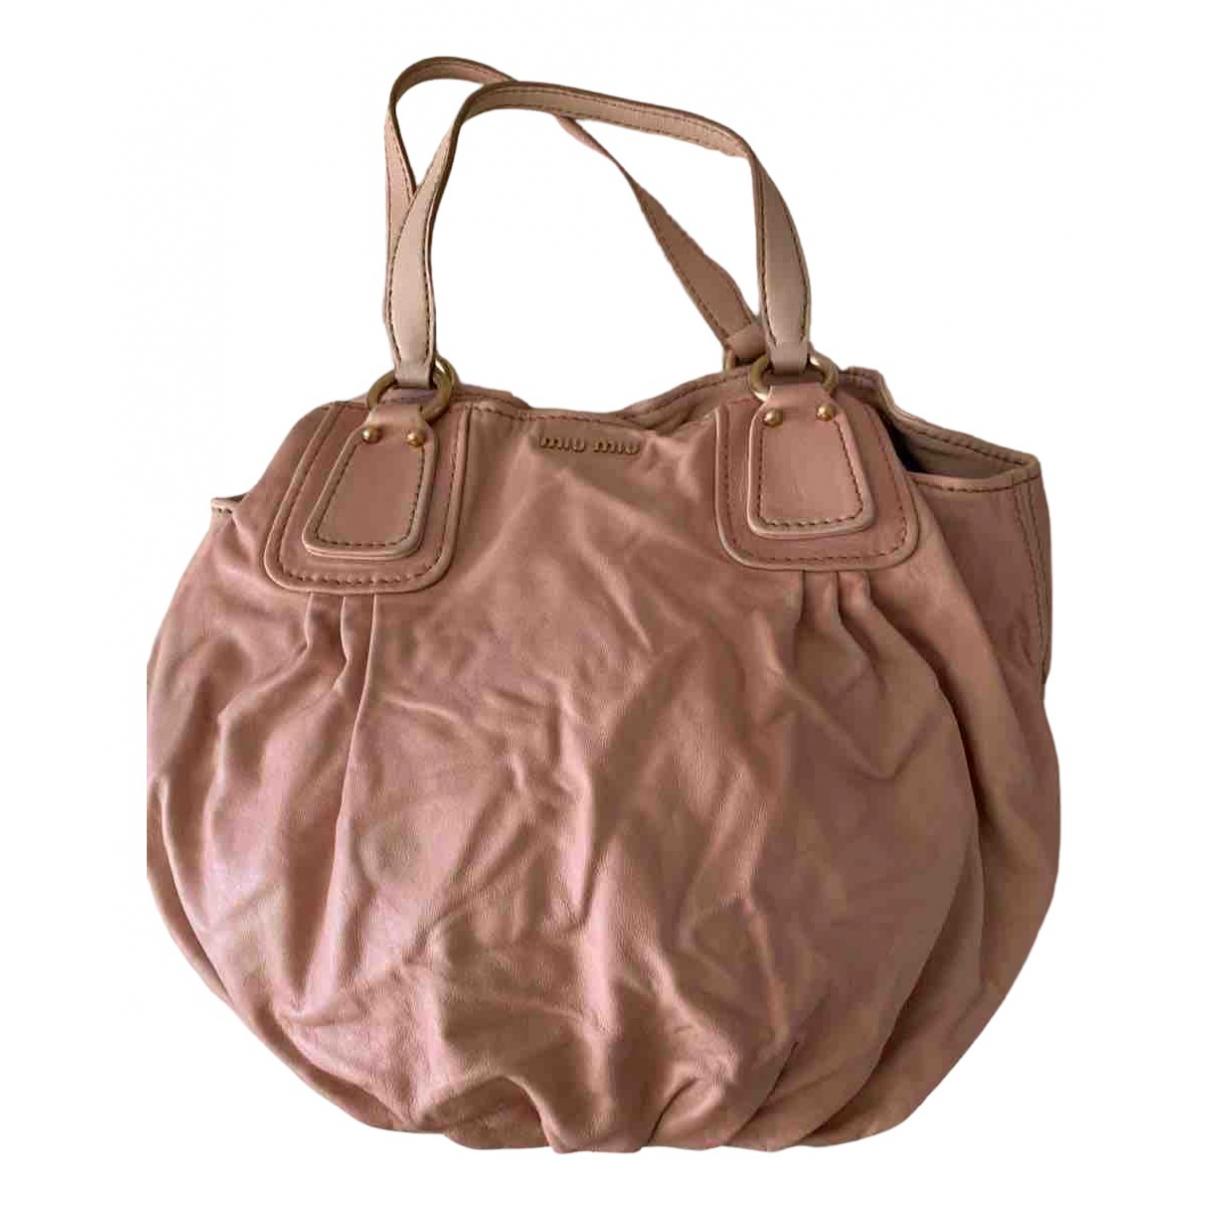 Miu Miu N Pink Leather handbag for Women N